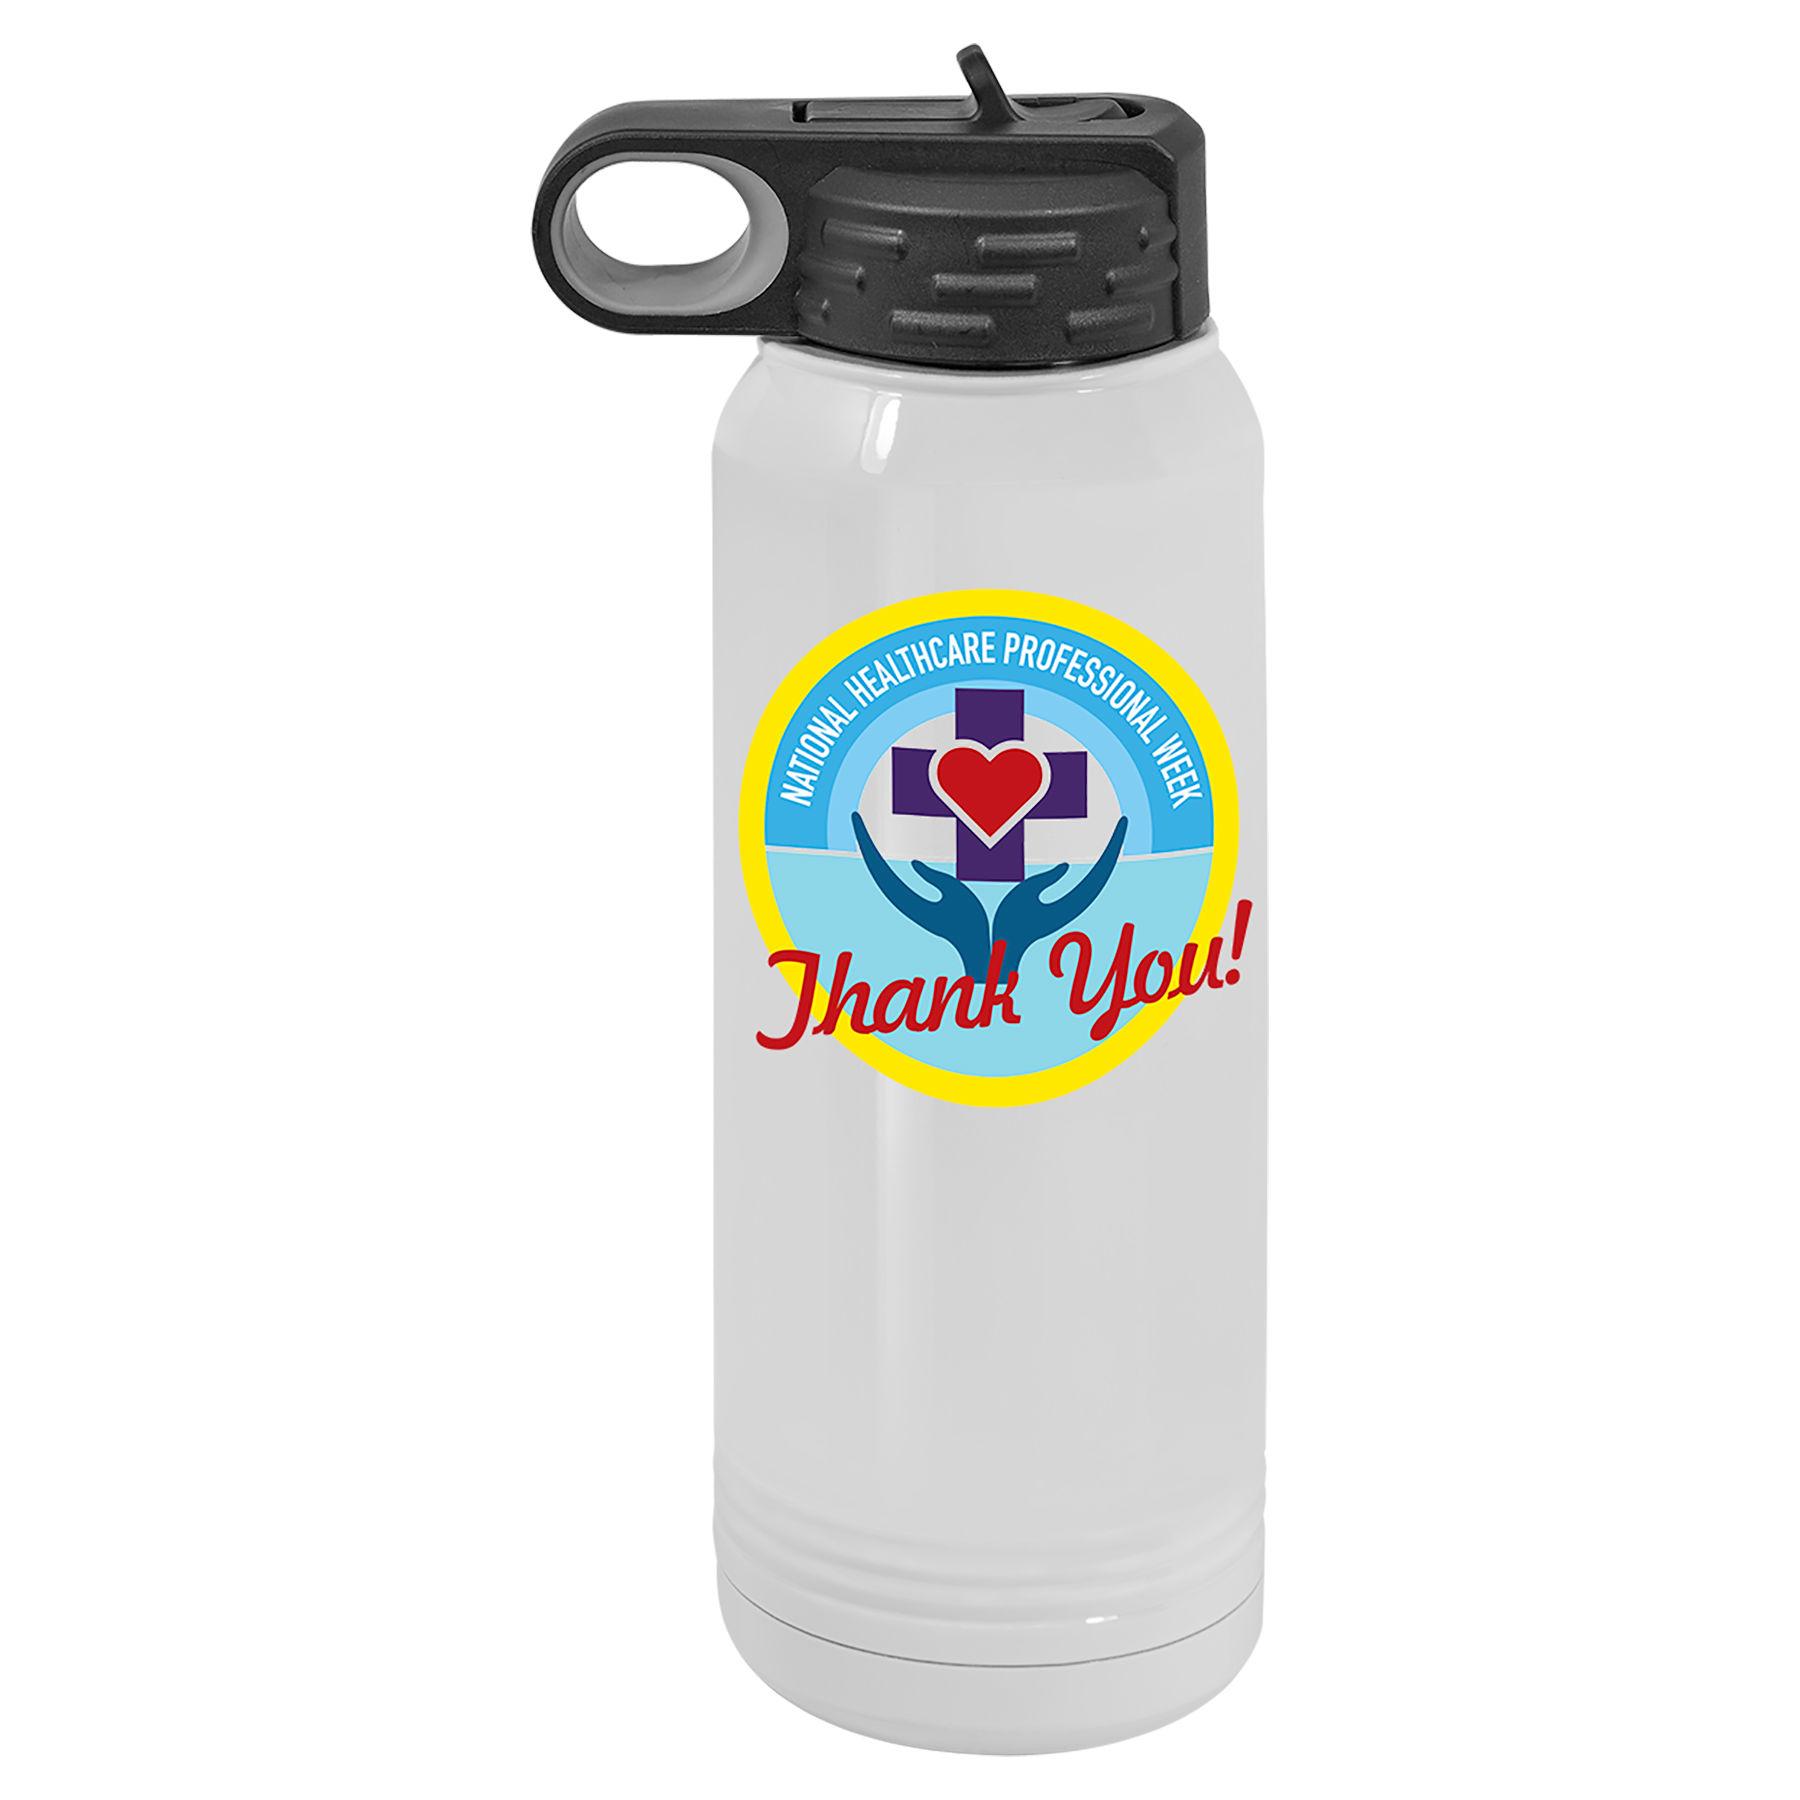 30 oz Full Color Water Bottles